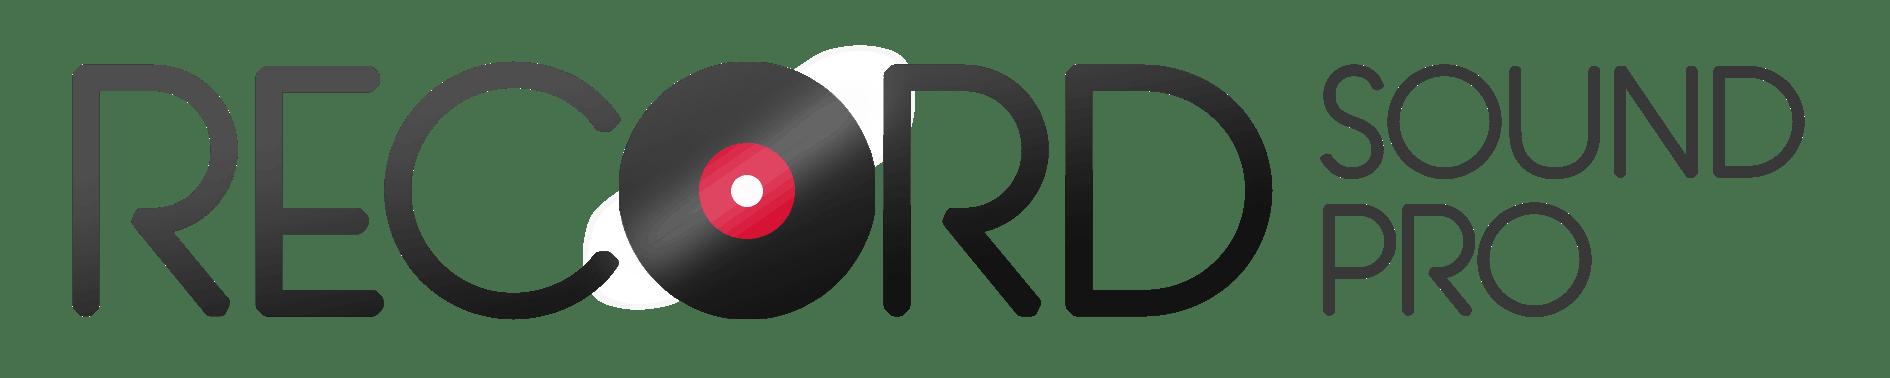 RecordSoundPro